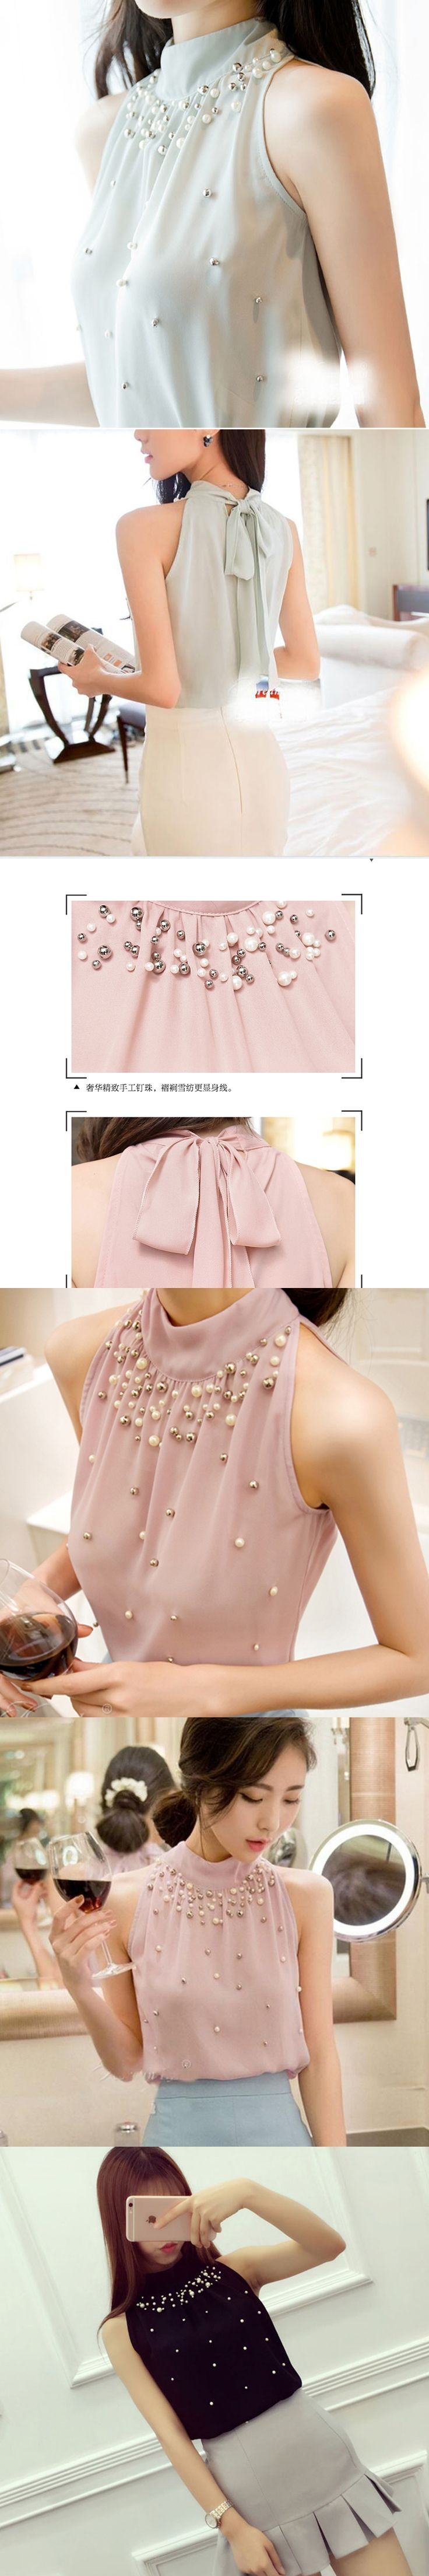 blusas feminina white Beading shirt women blouses 2017 vetement femme plus size 3xl chiffon blouse summer tops camisetas mujer